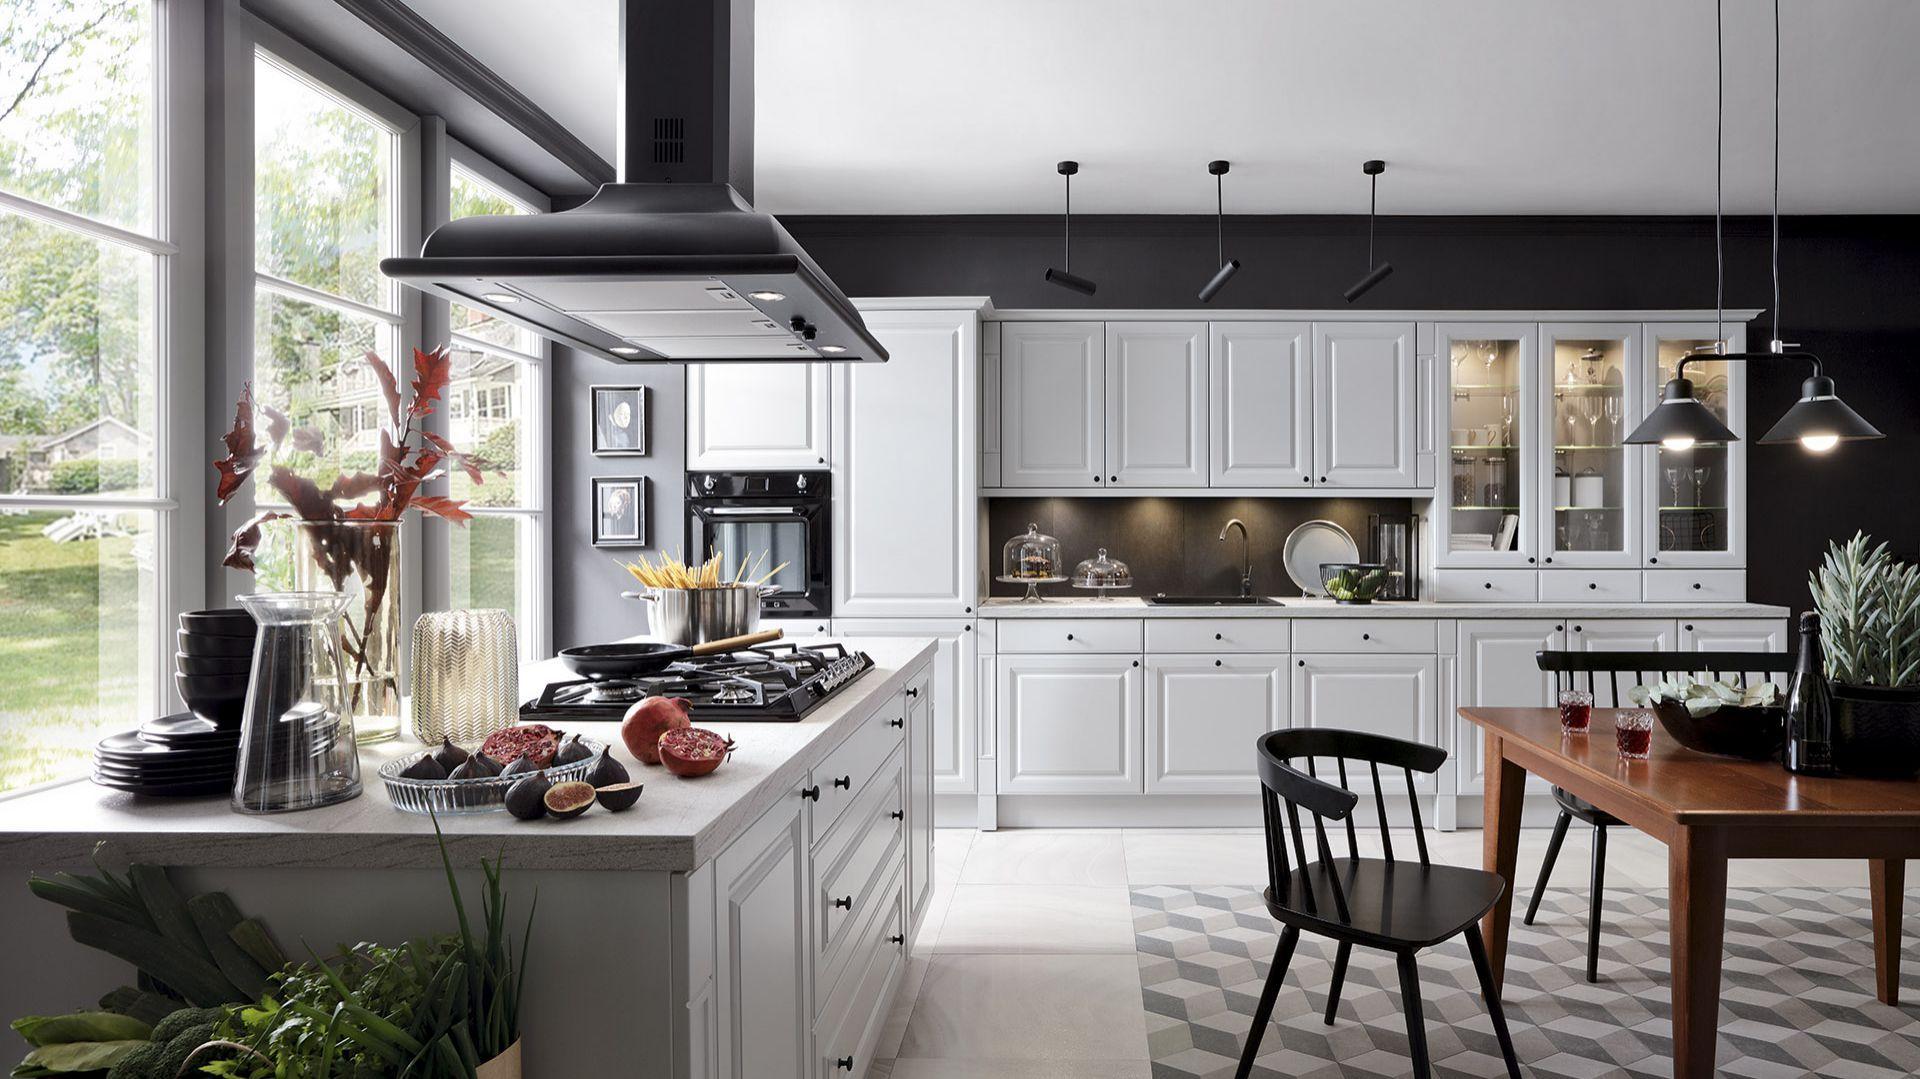 7 Pomyslow Na Biala Kuchnie Best Kitchen Designs Kitchen Design Home